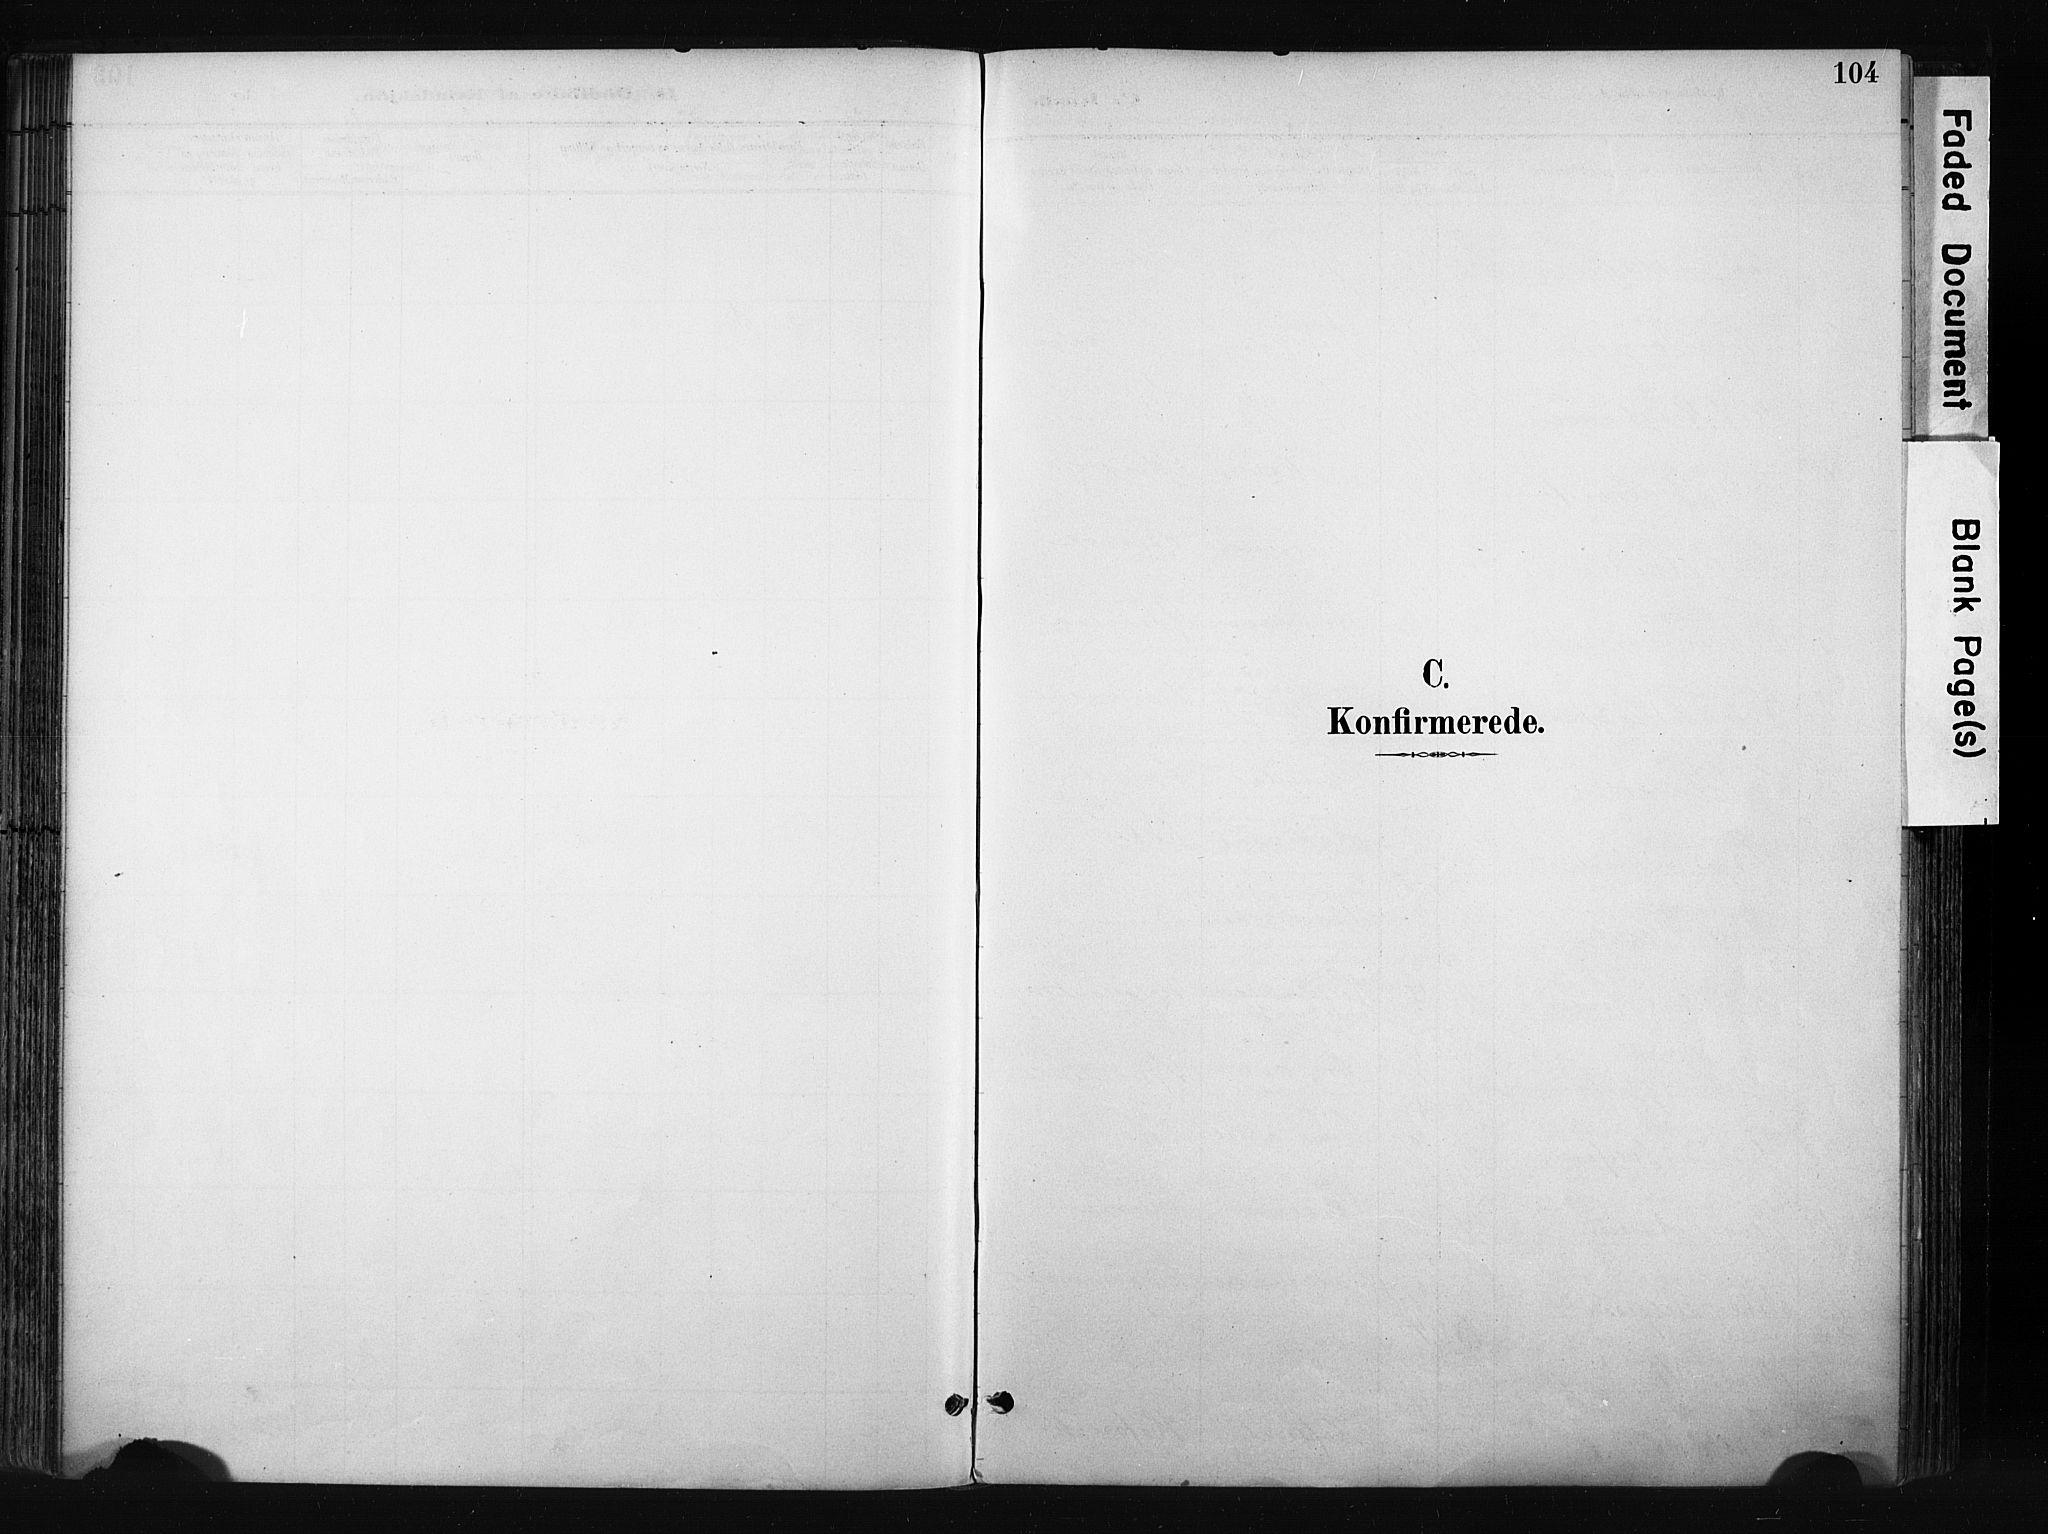 SAH, Gran prestekontor, Ministerialbok nr. 17, 1889-1897, s. 104